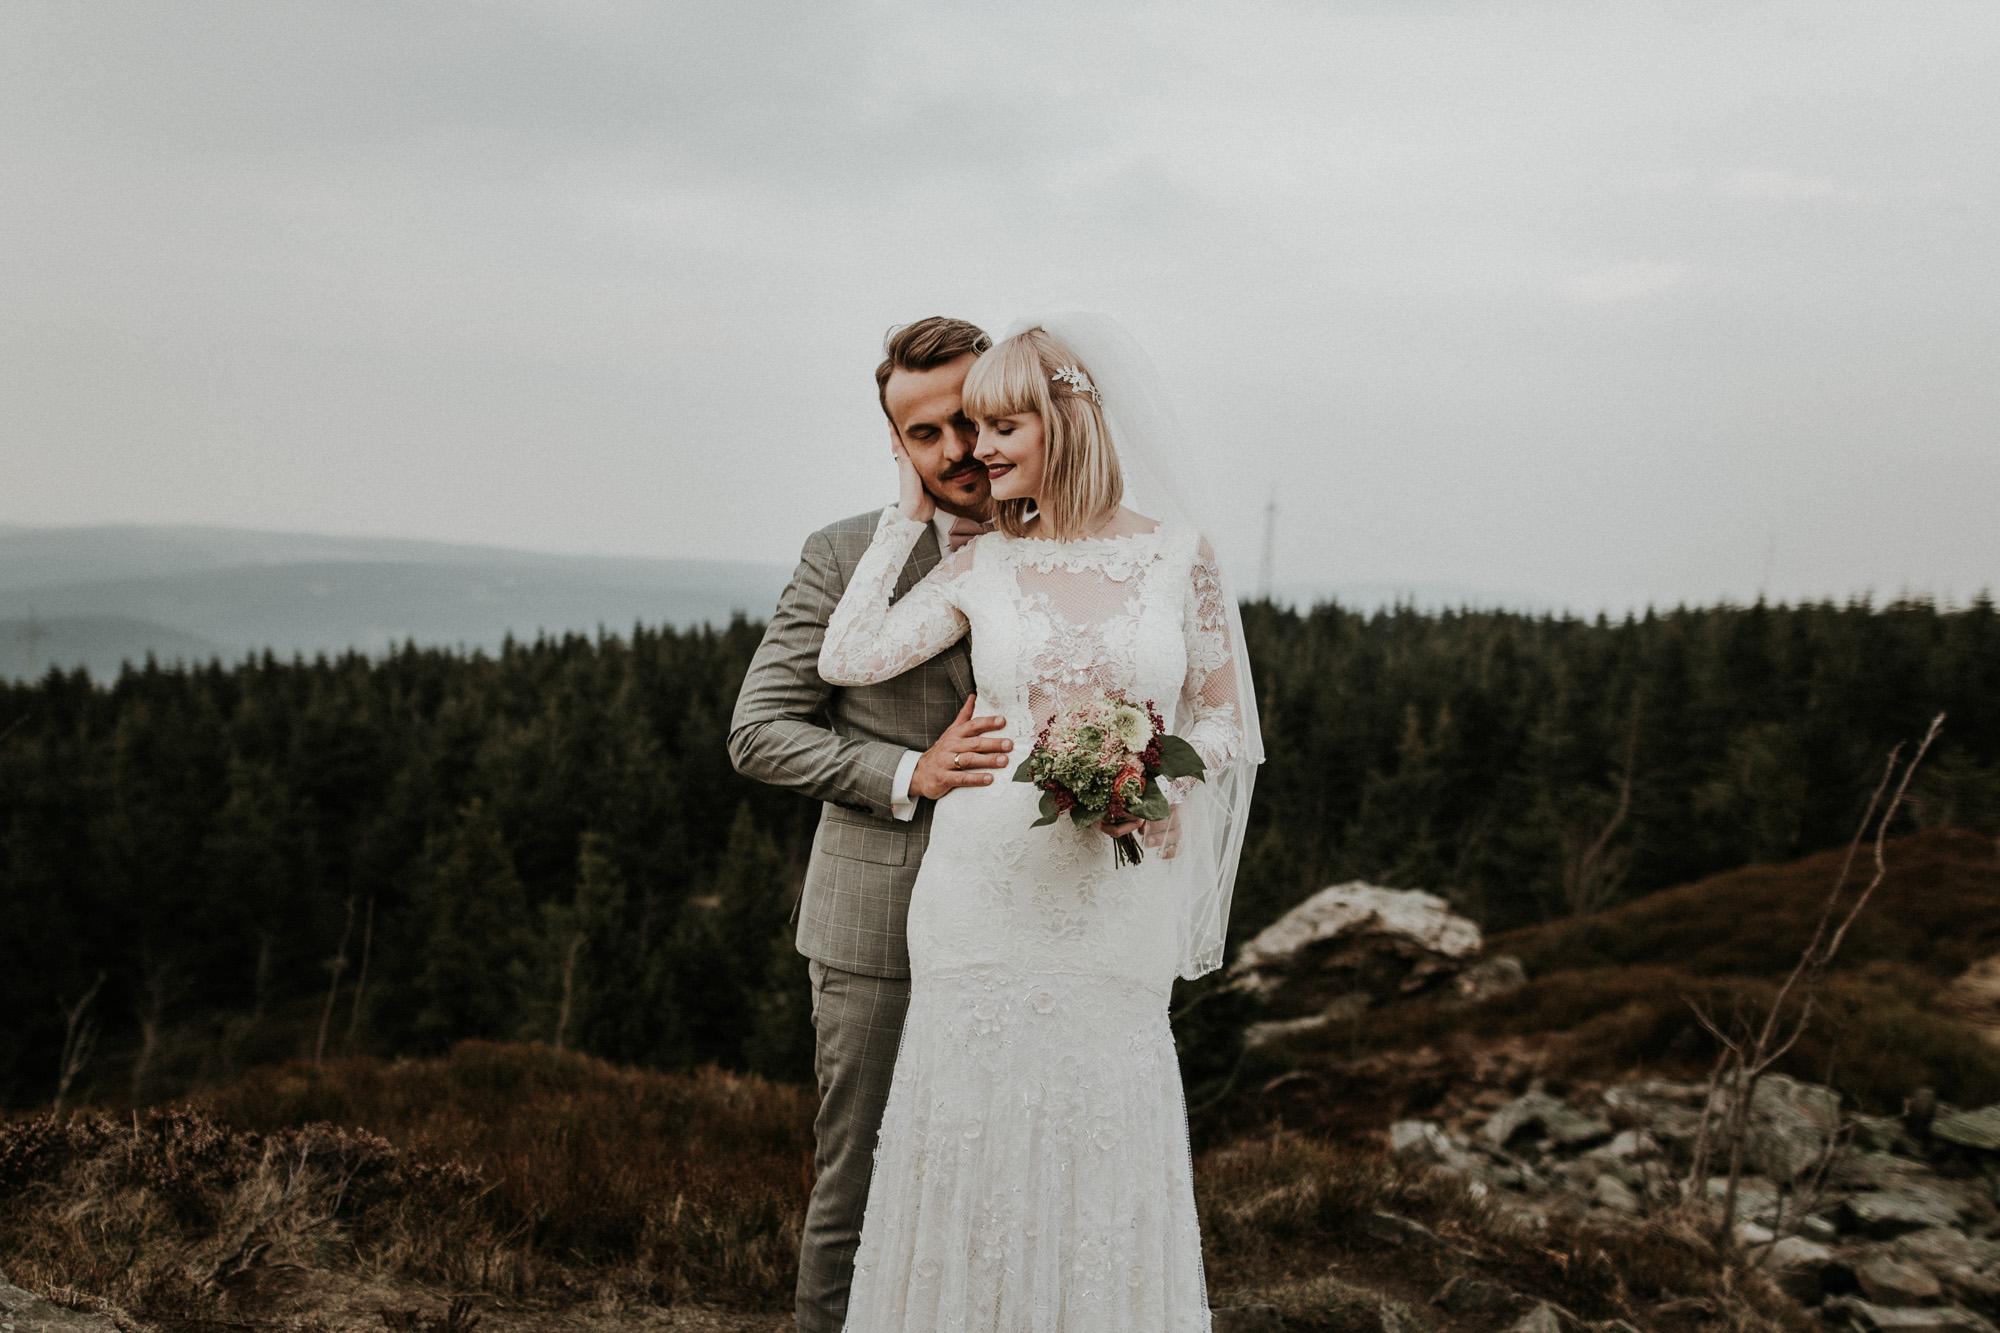 DanielaMarquardtPhotography_Hochzeitsfotograf_Düsseldorf_Köln_Mallorca_Bayern_Austria_Harz_LinaundMaik_Afterwedding-Shooting_Weddingphotographer_Ibiza_Tuskany_Italien_Toskana32